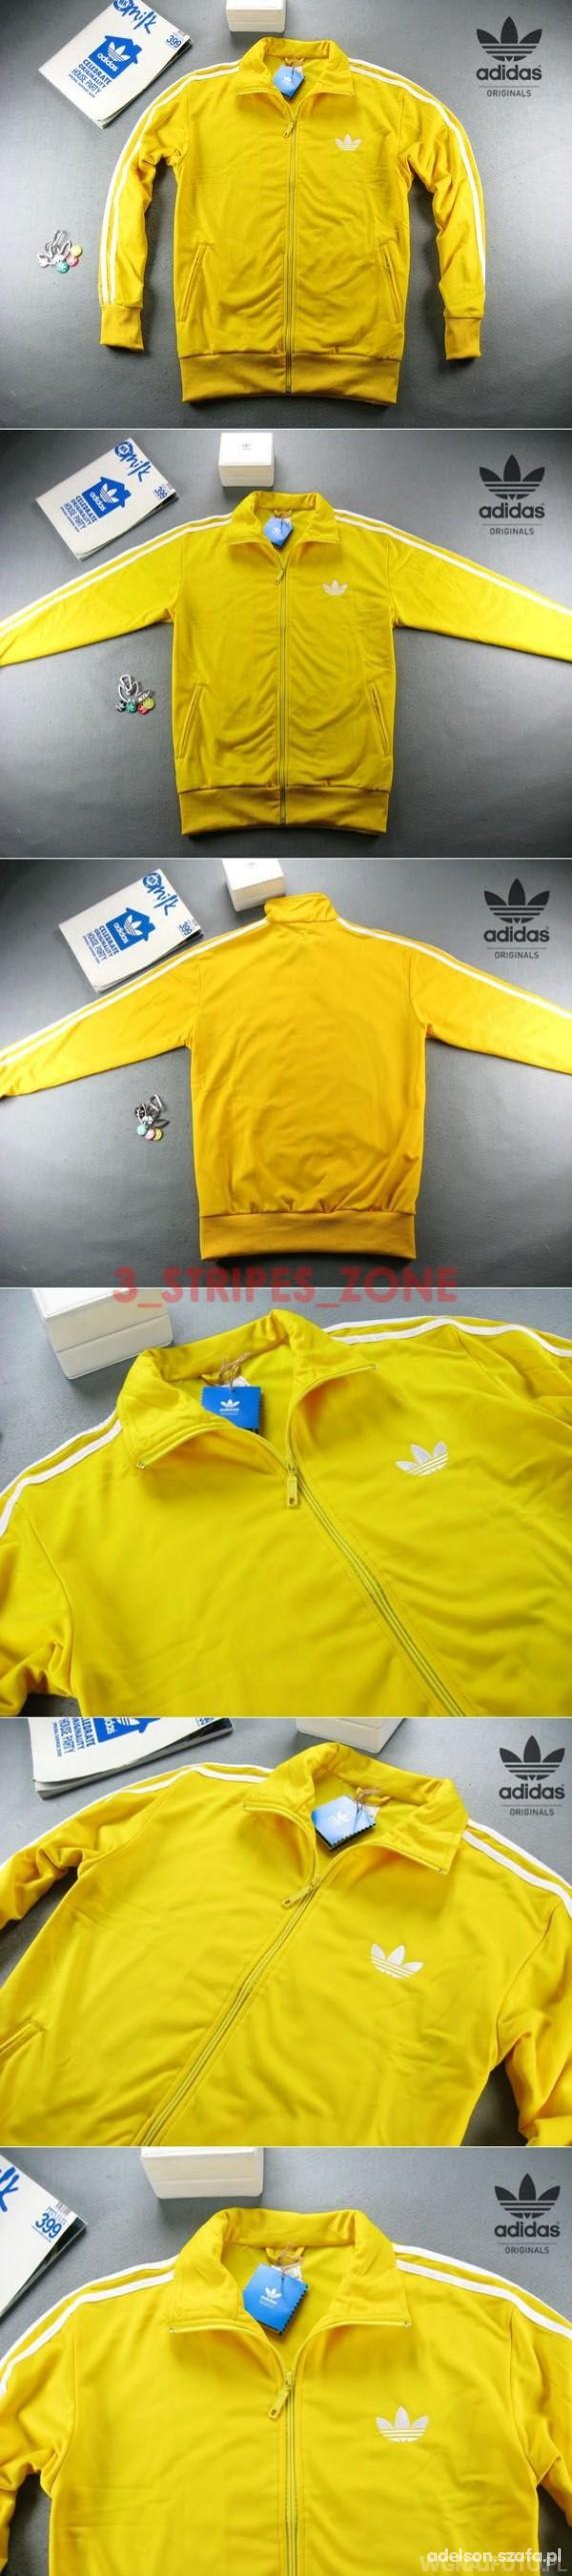 Ubrania bluza zółta adidas